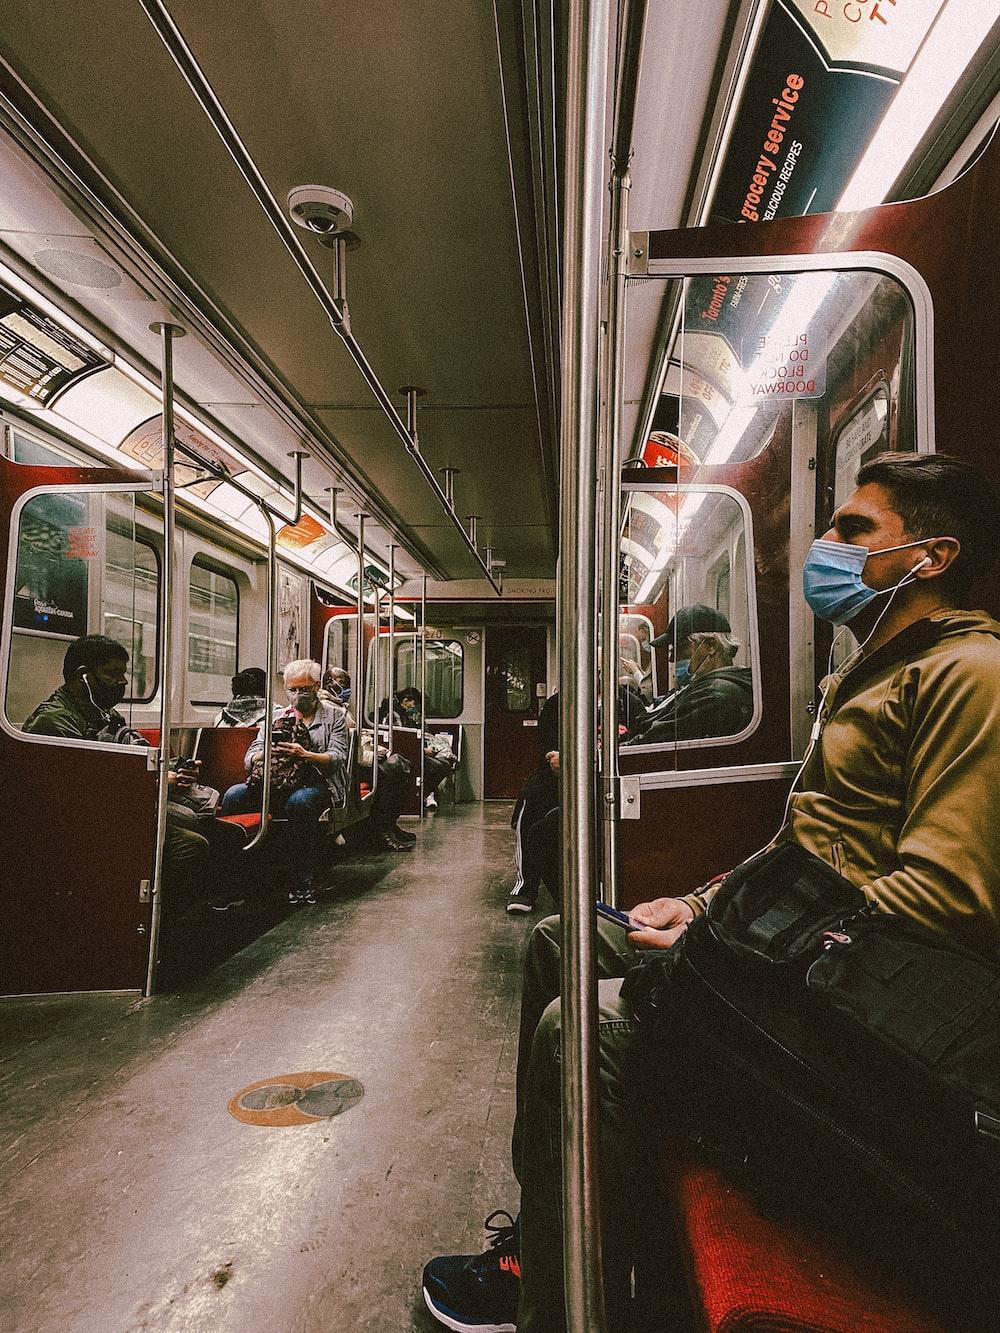 man in brown jacket sitting on train seat